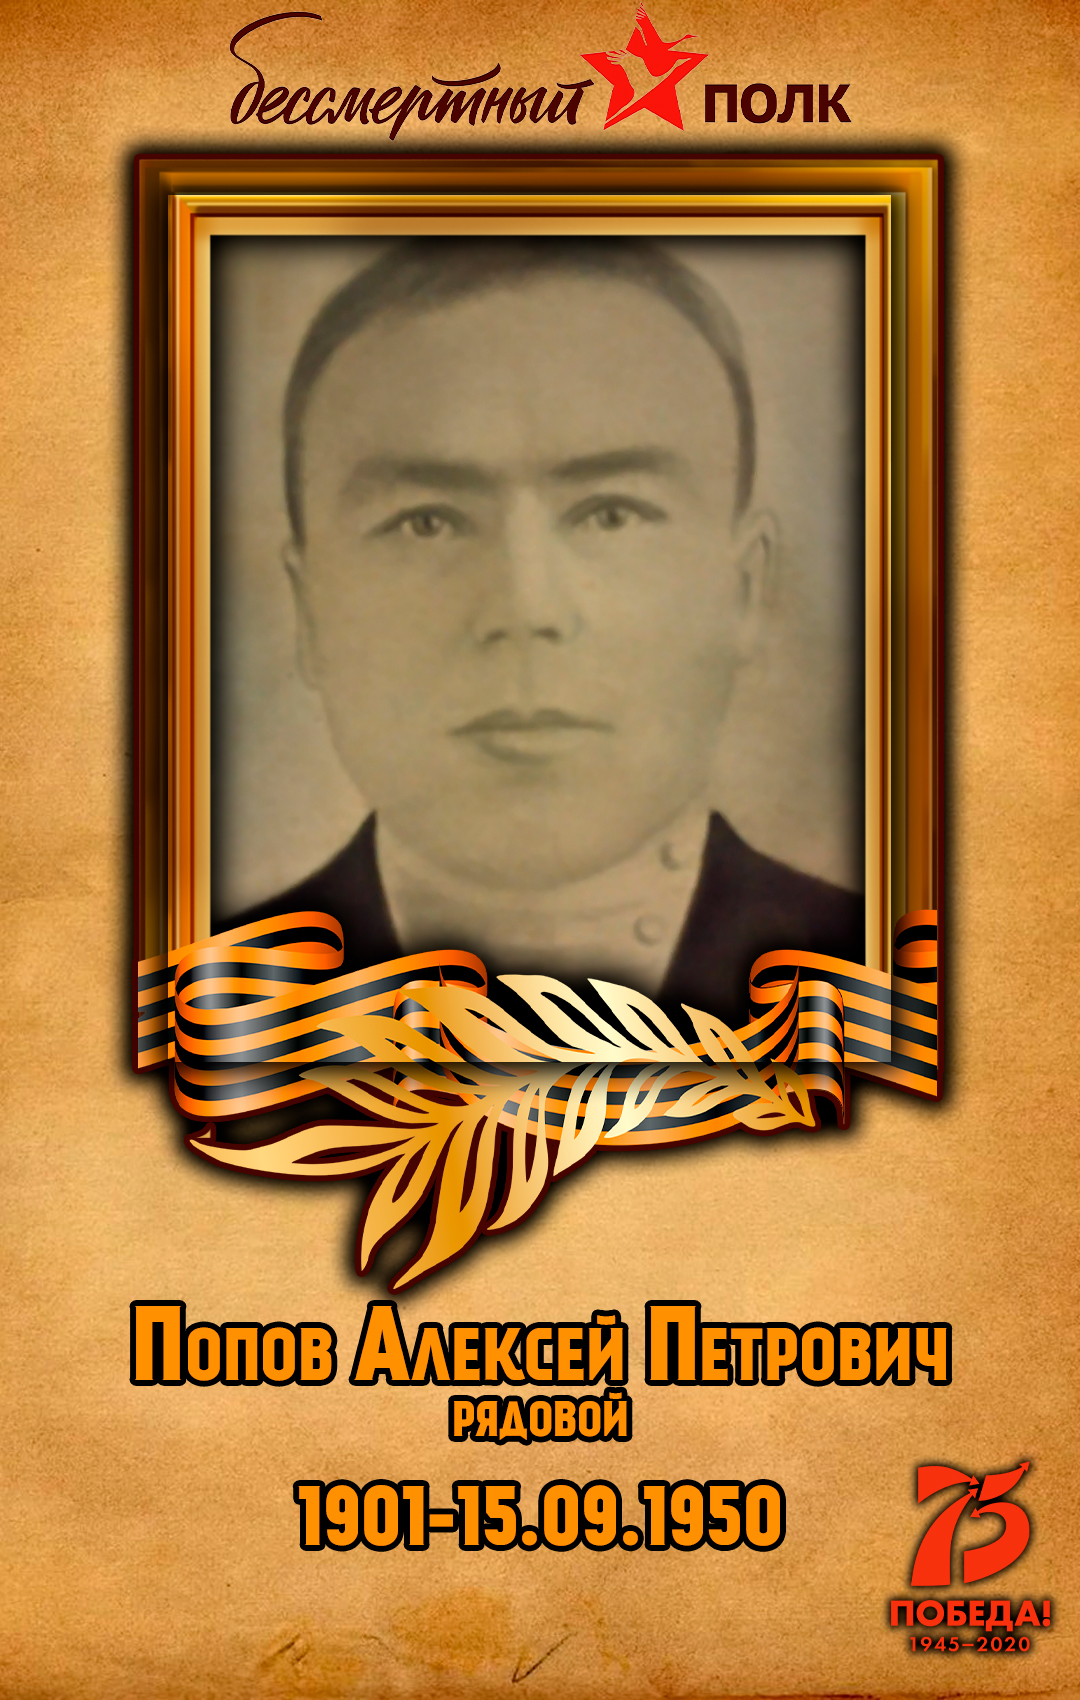 Попов-Алексей-Петрович